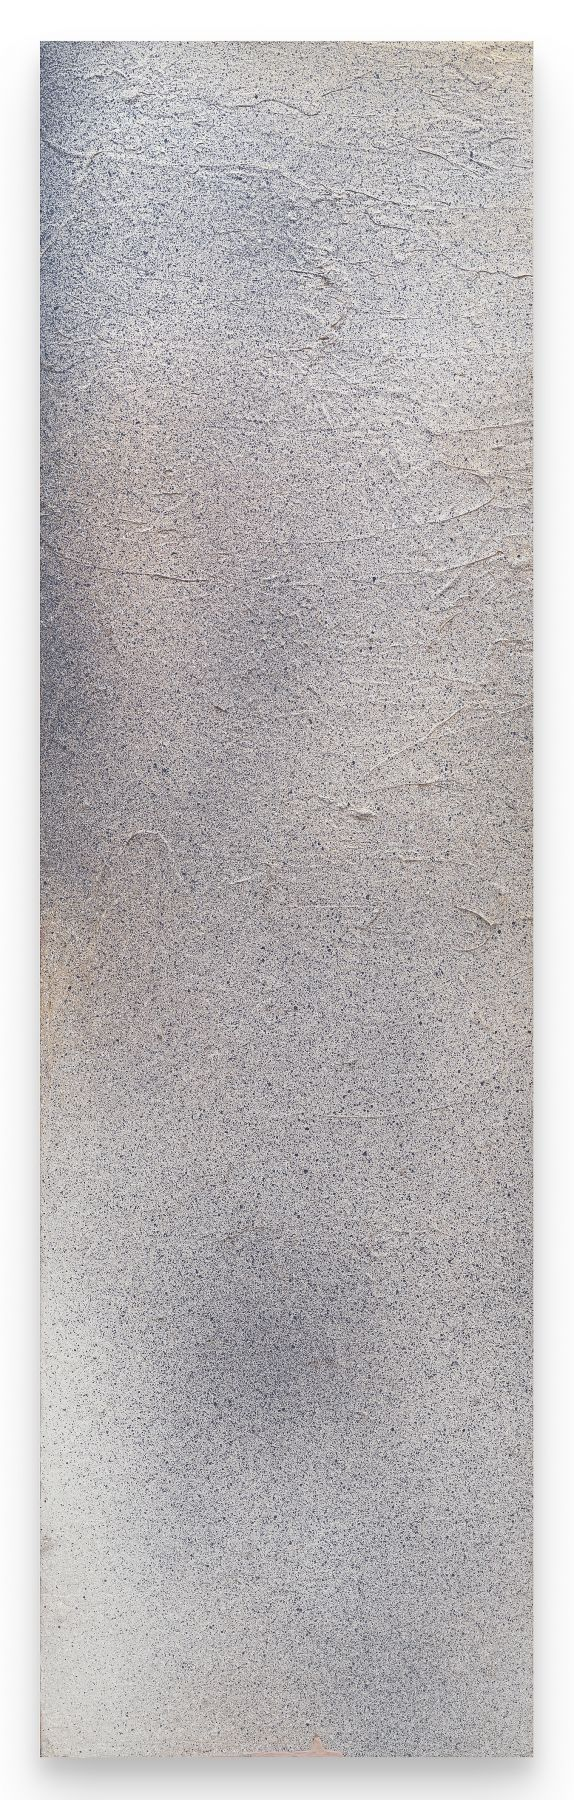 Nimrod Measure 10, 1978, Acrylic on canvas